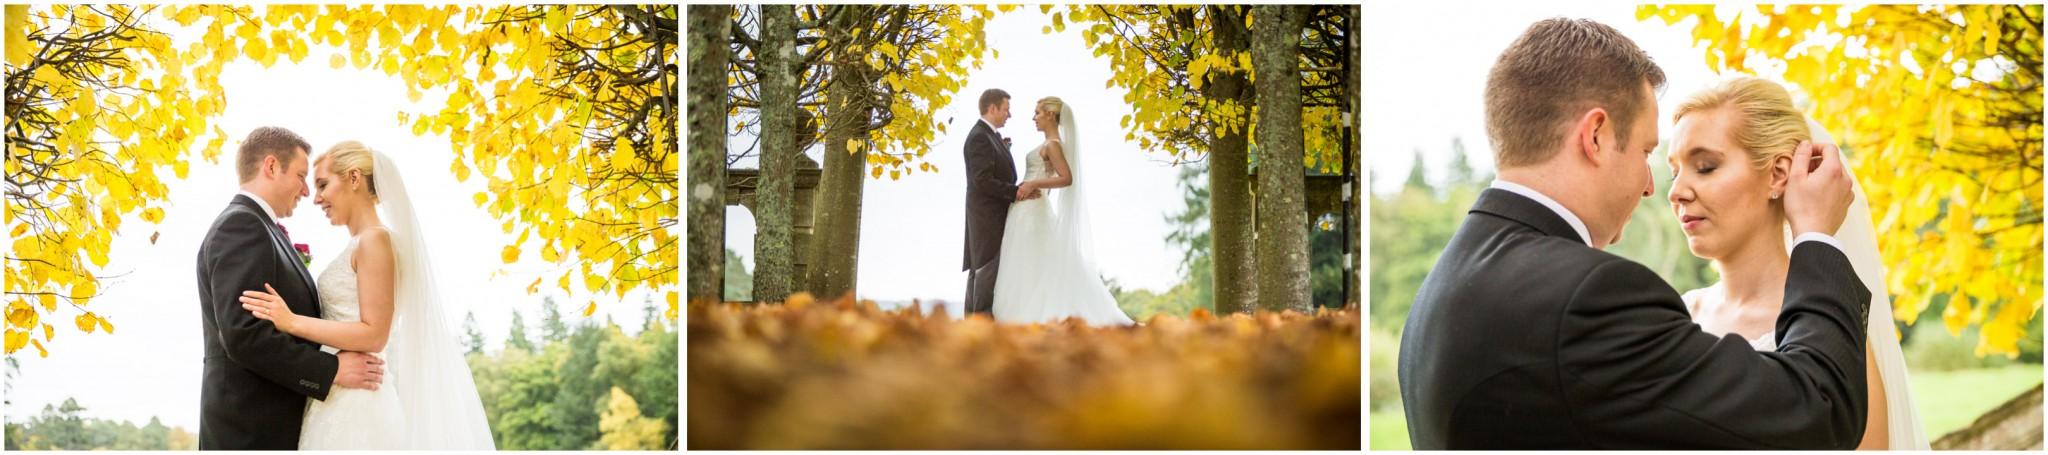 Rhinefield House Wedding Bride & Groom in autumn leaves